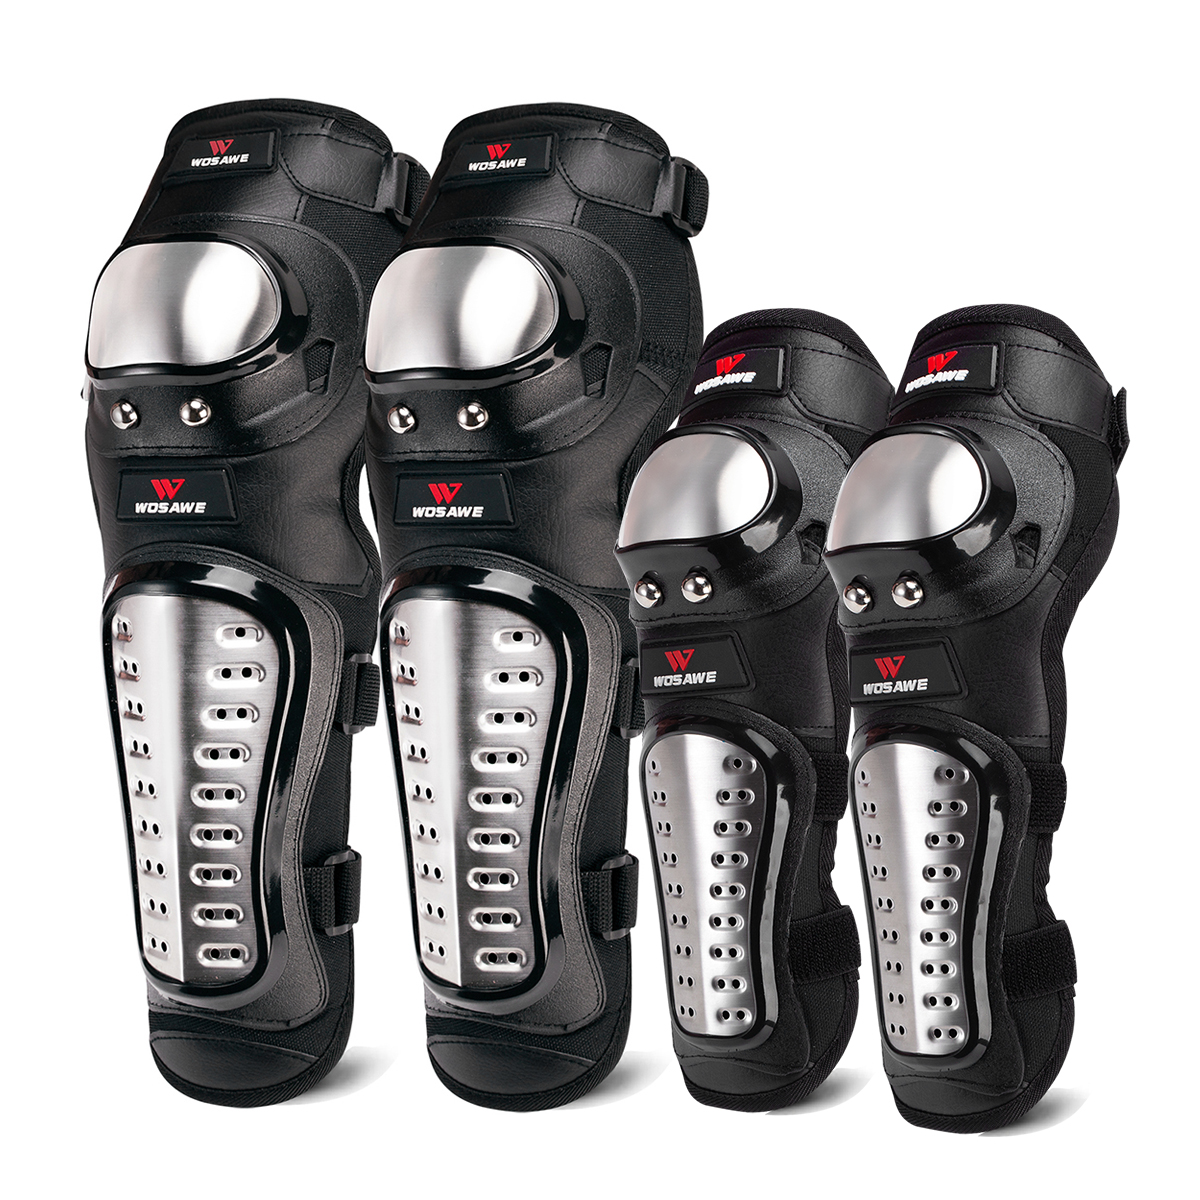 WOSAWE Hard Shell Moto Knee Pads Set Brace Support Sports Off-Road Guard MTB Snowboard Kneepad Hockey Motorcycle Protection Kits